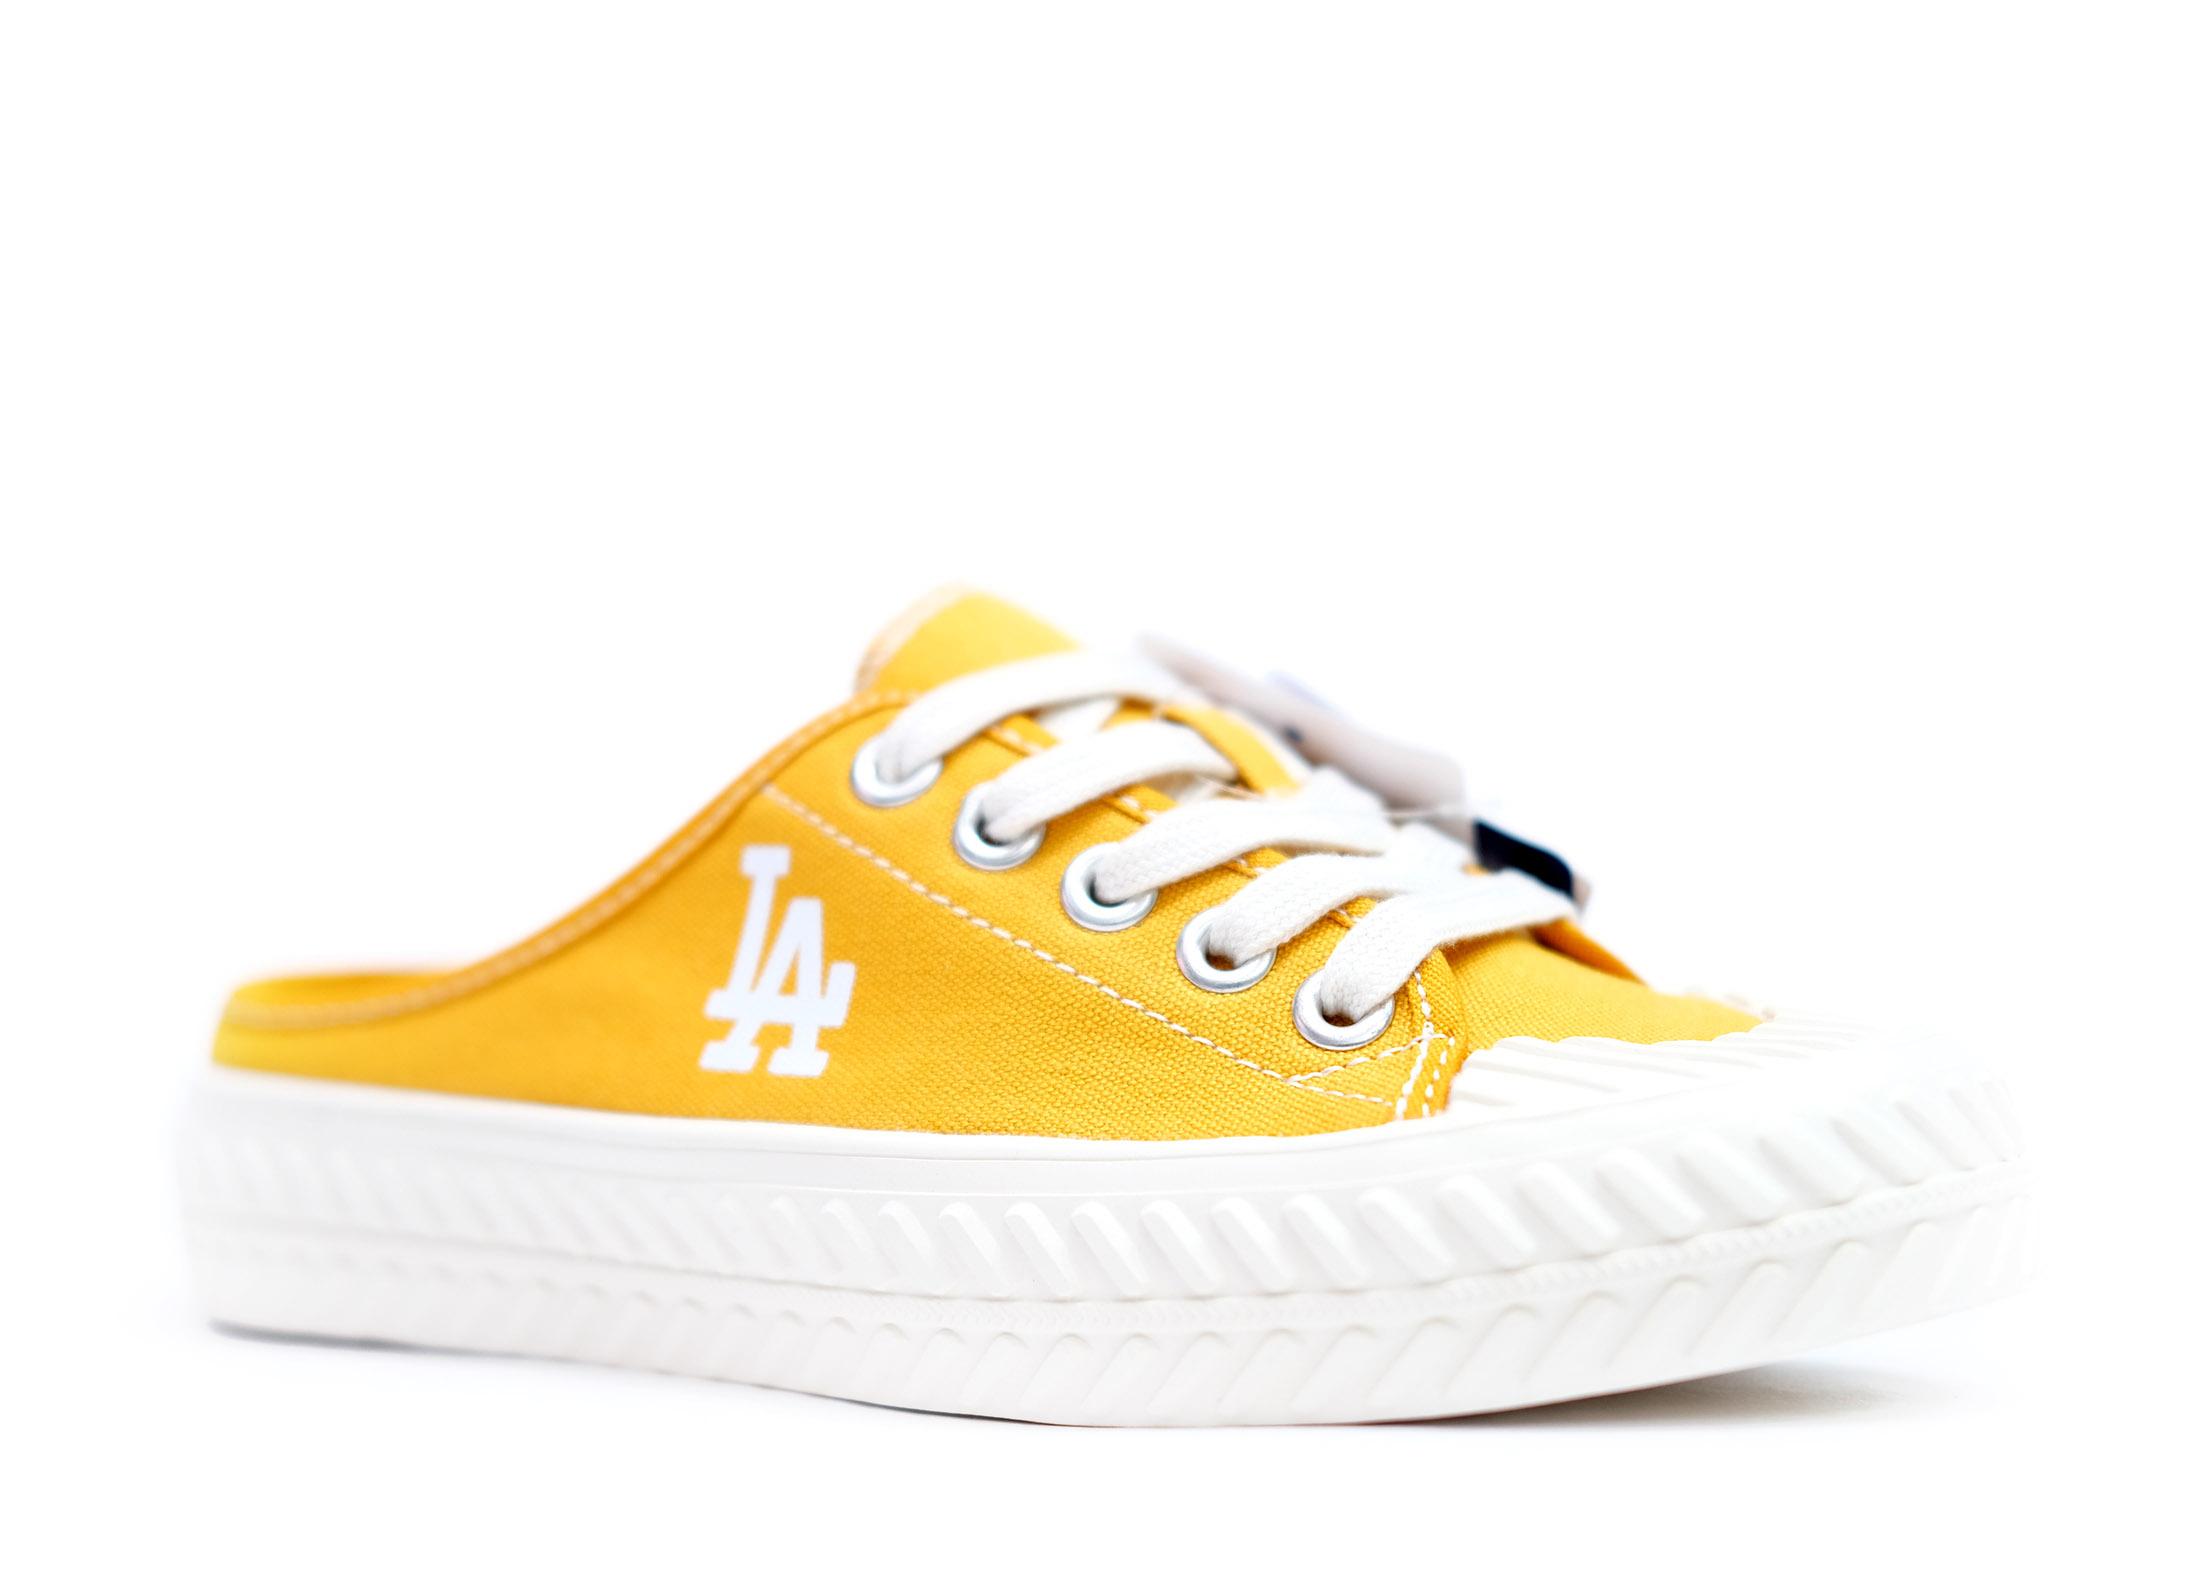 mlb-playball-origin-mule-la-dodgers-yellow